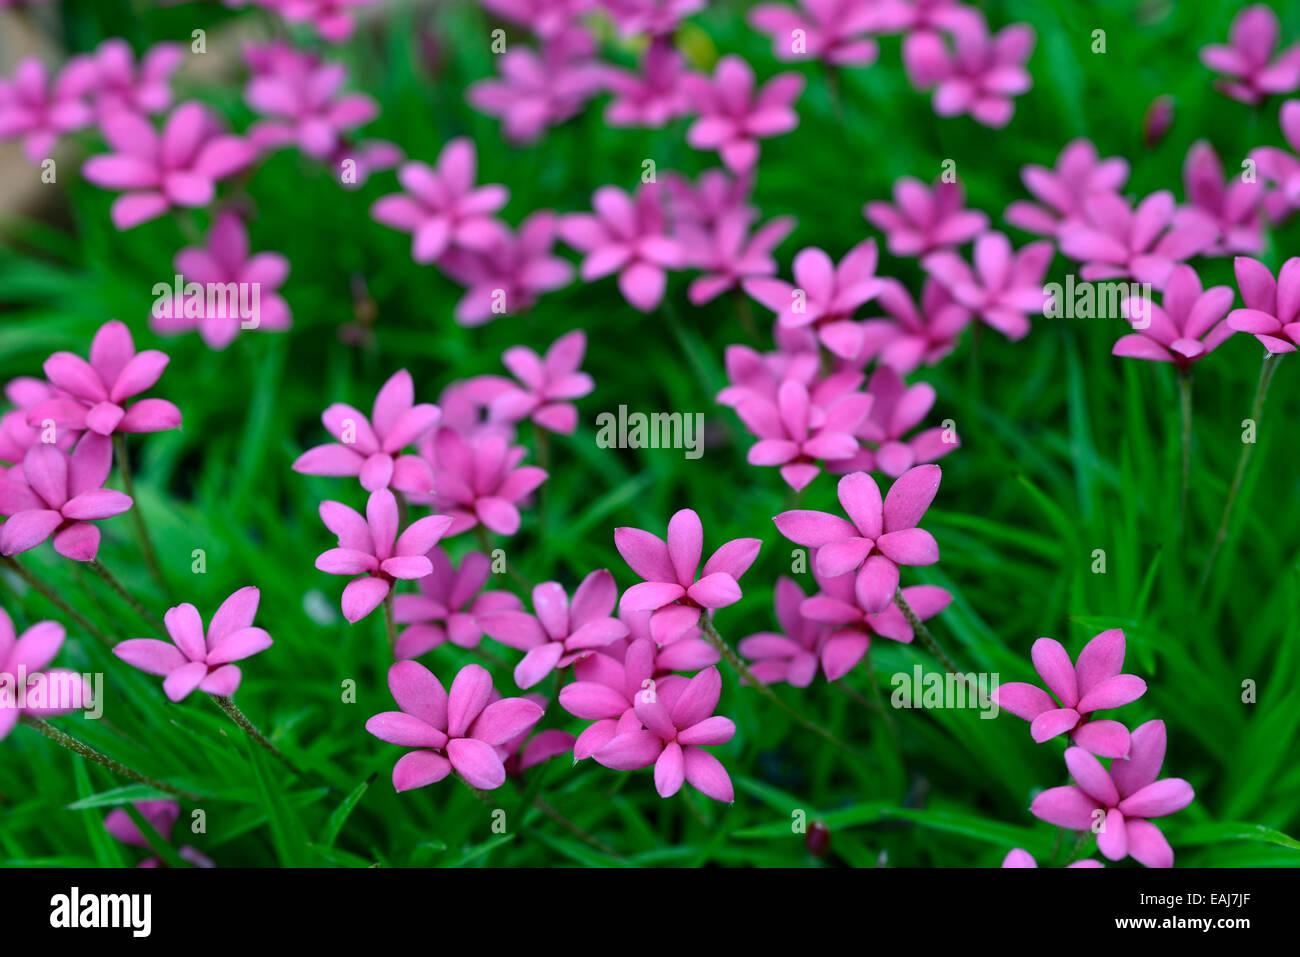 Pink Flowered Rhodohypoxis Milloides Venetian Flower Bloom Blossom